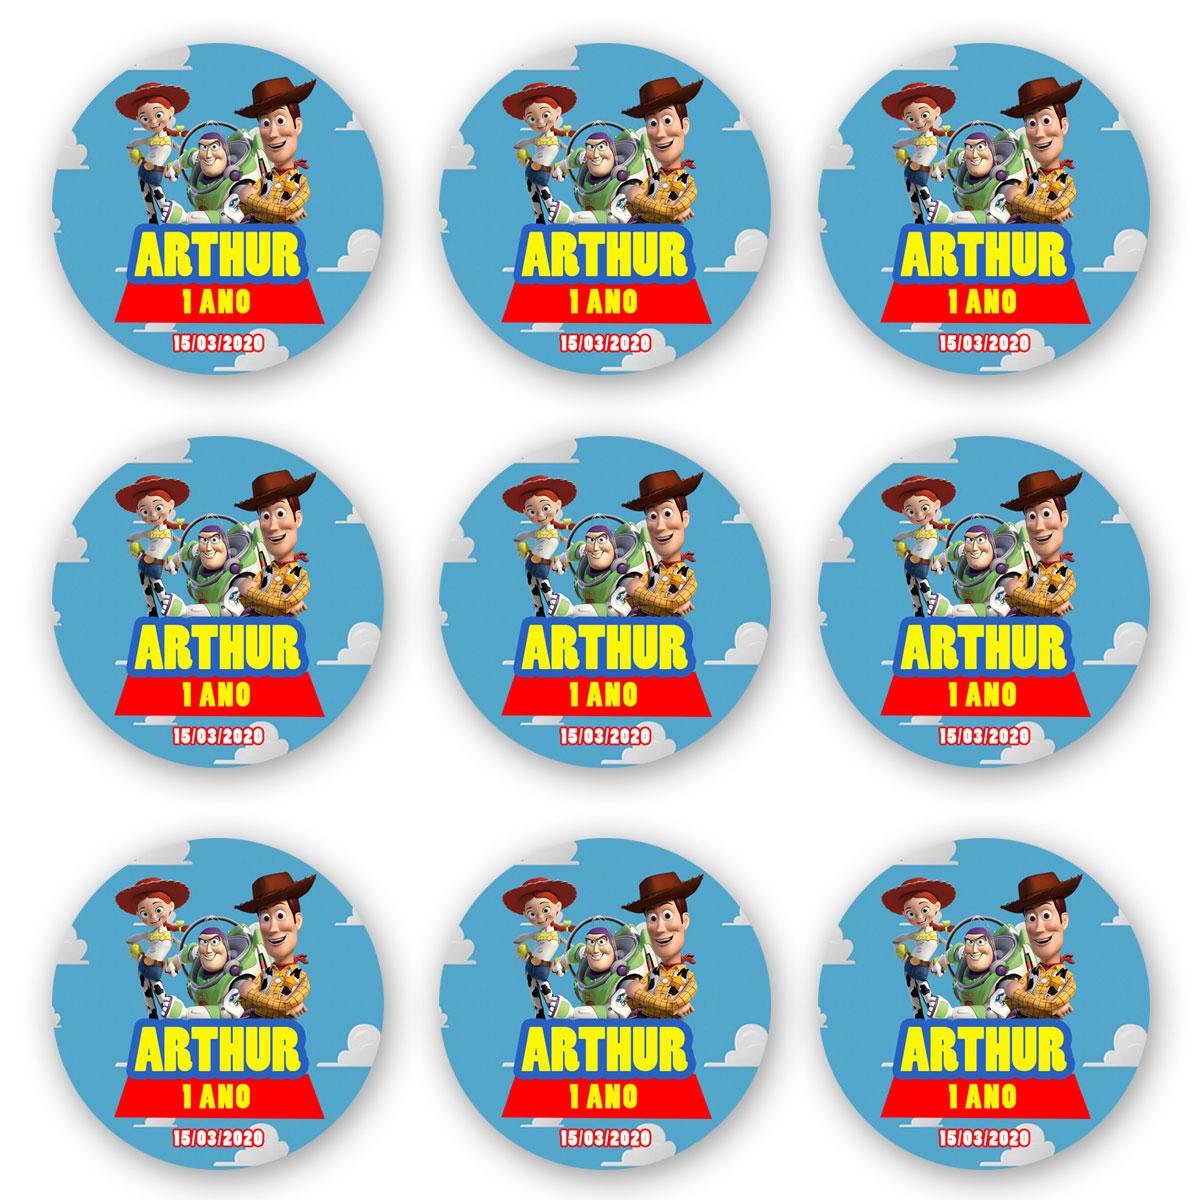 Cartela de Adesivo Personalizado Redondo 10x10 (2 adesivos)